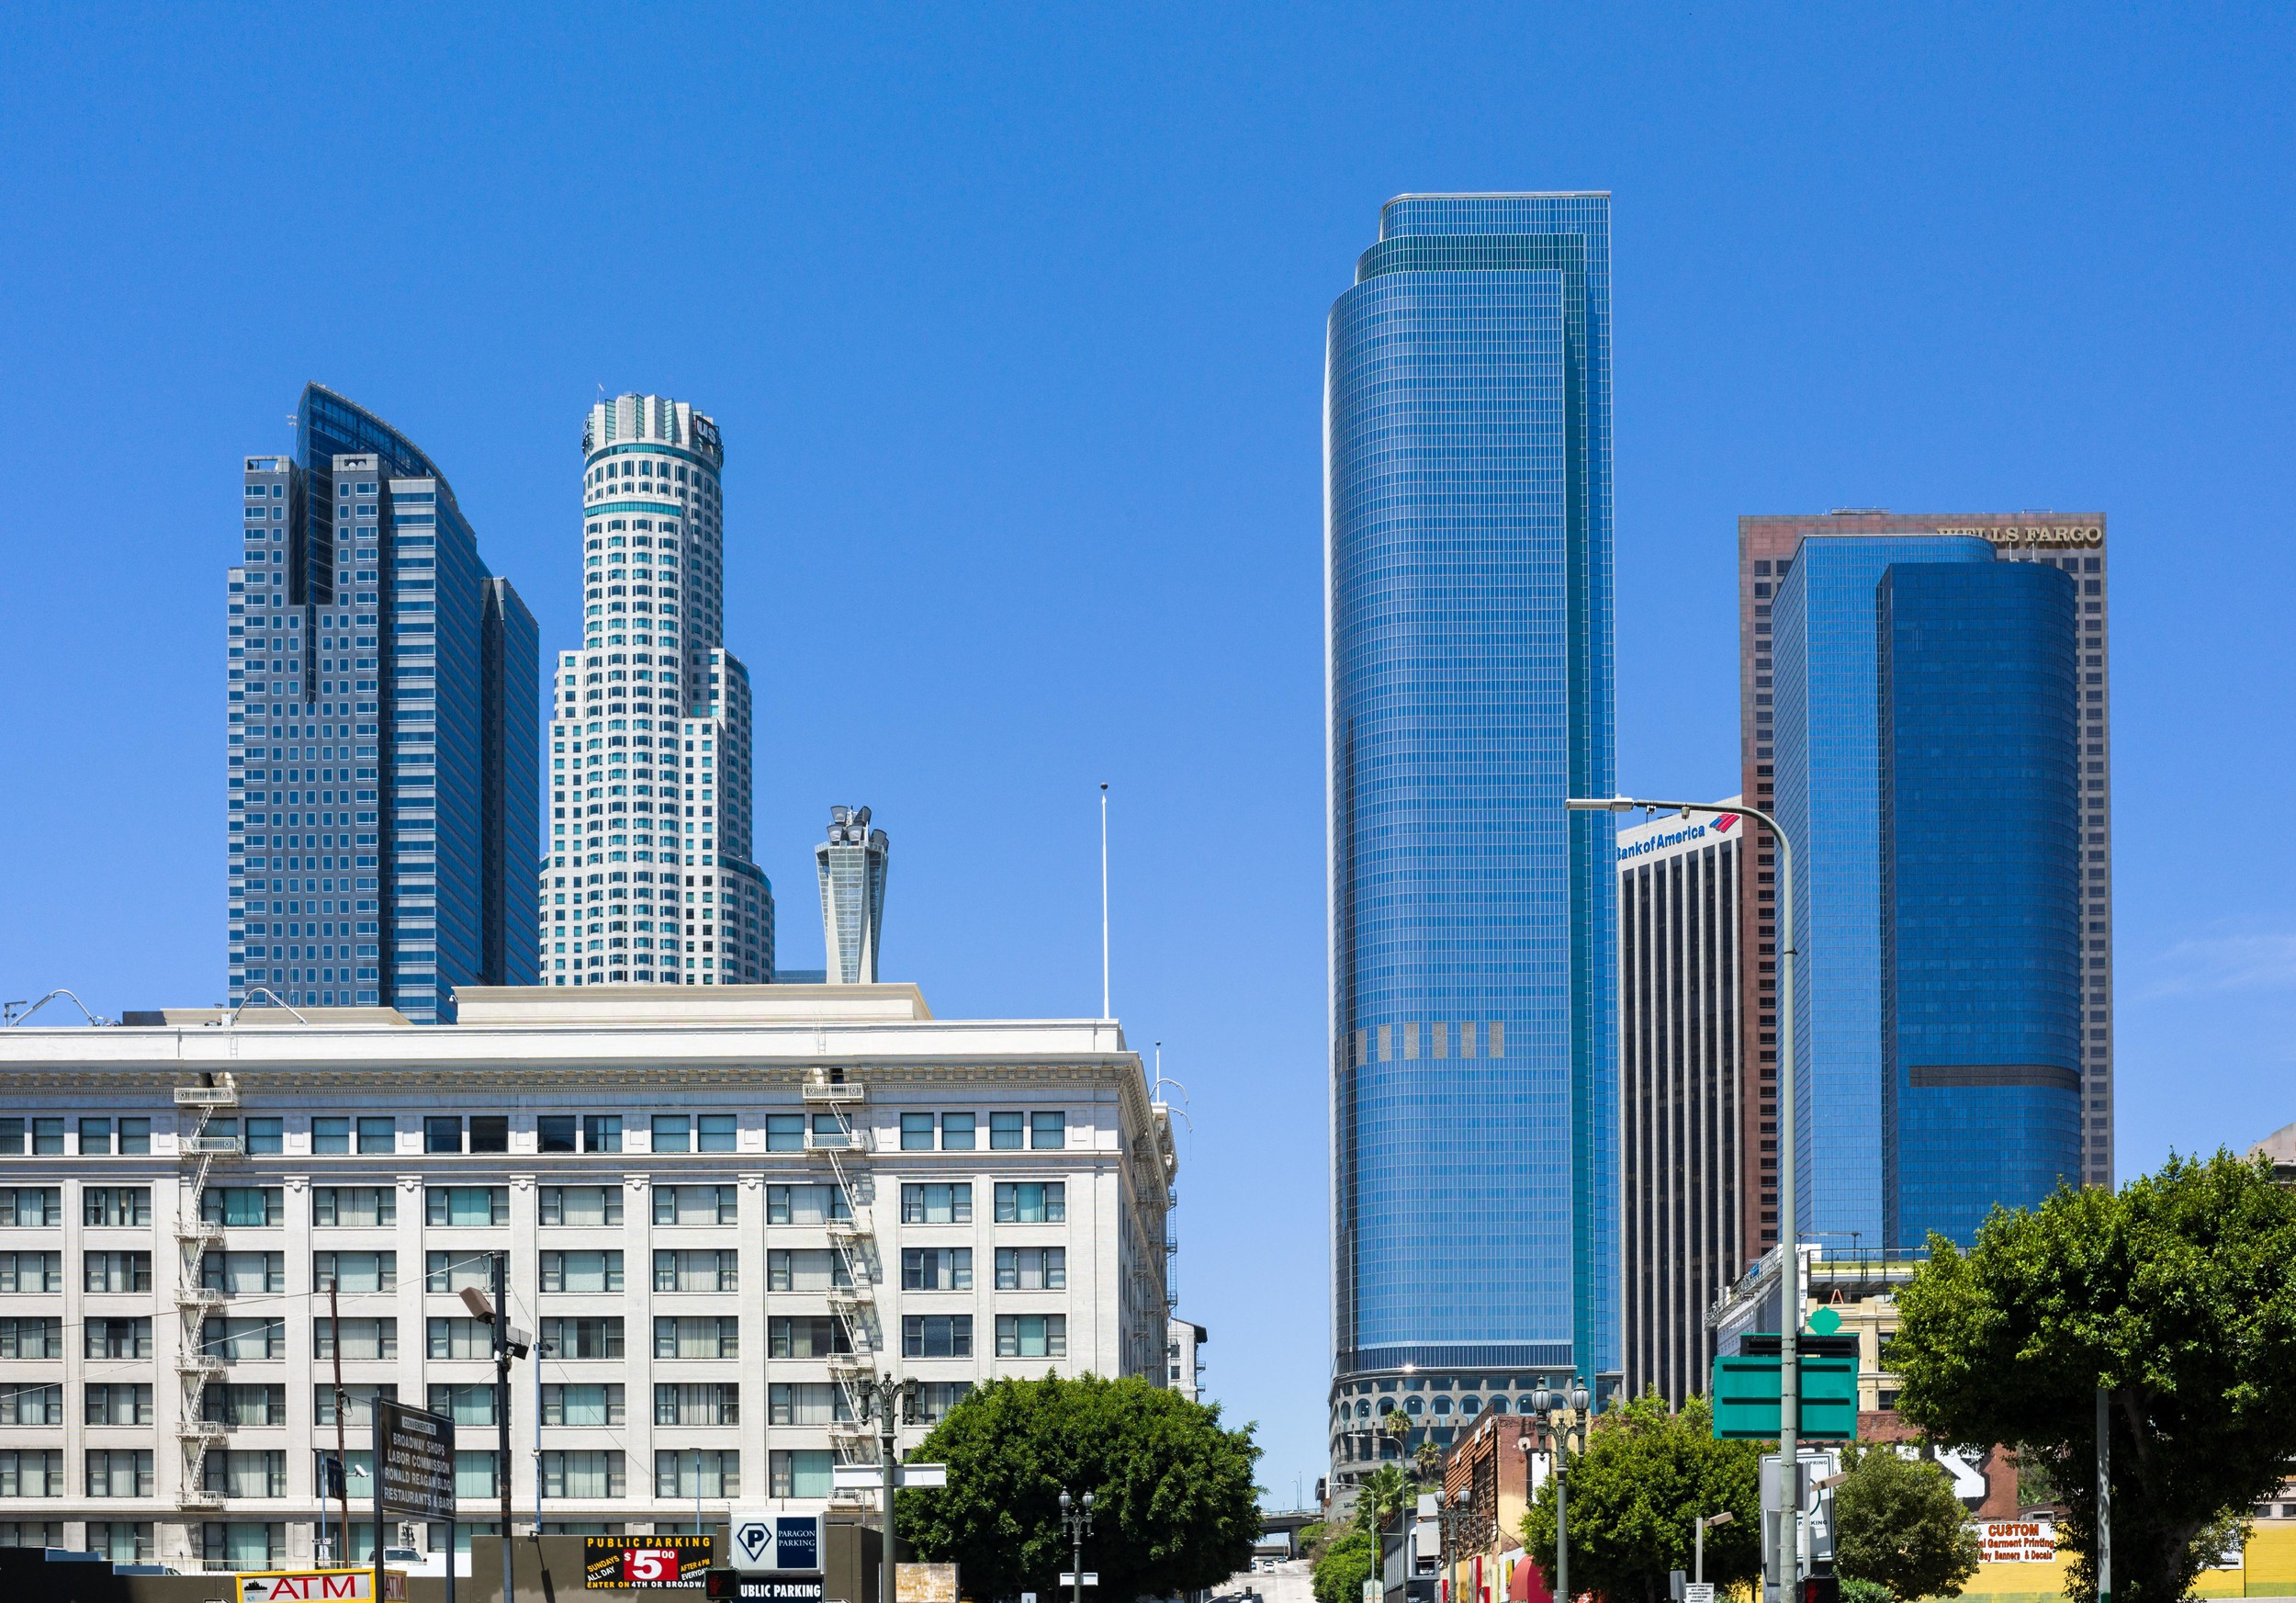 A Blue Day in LA